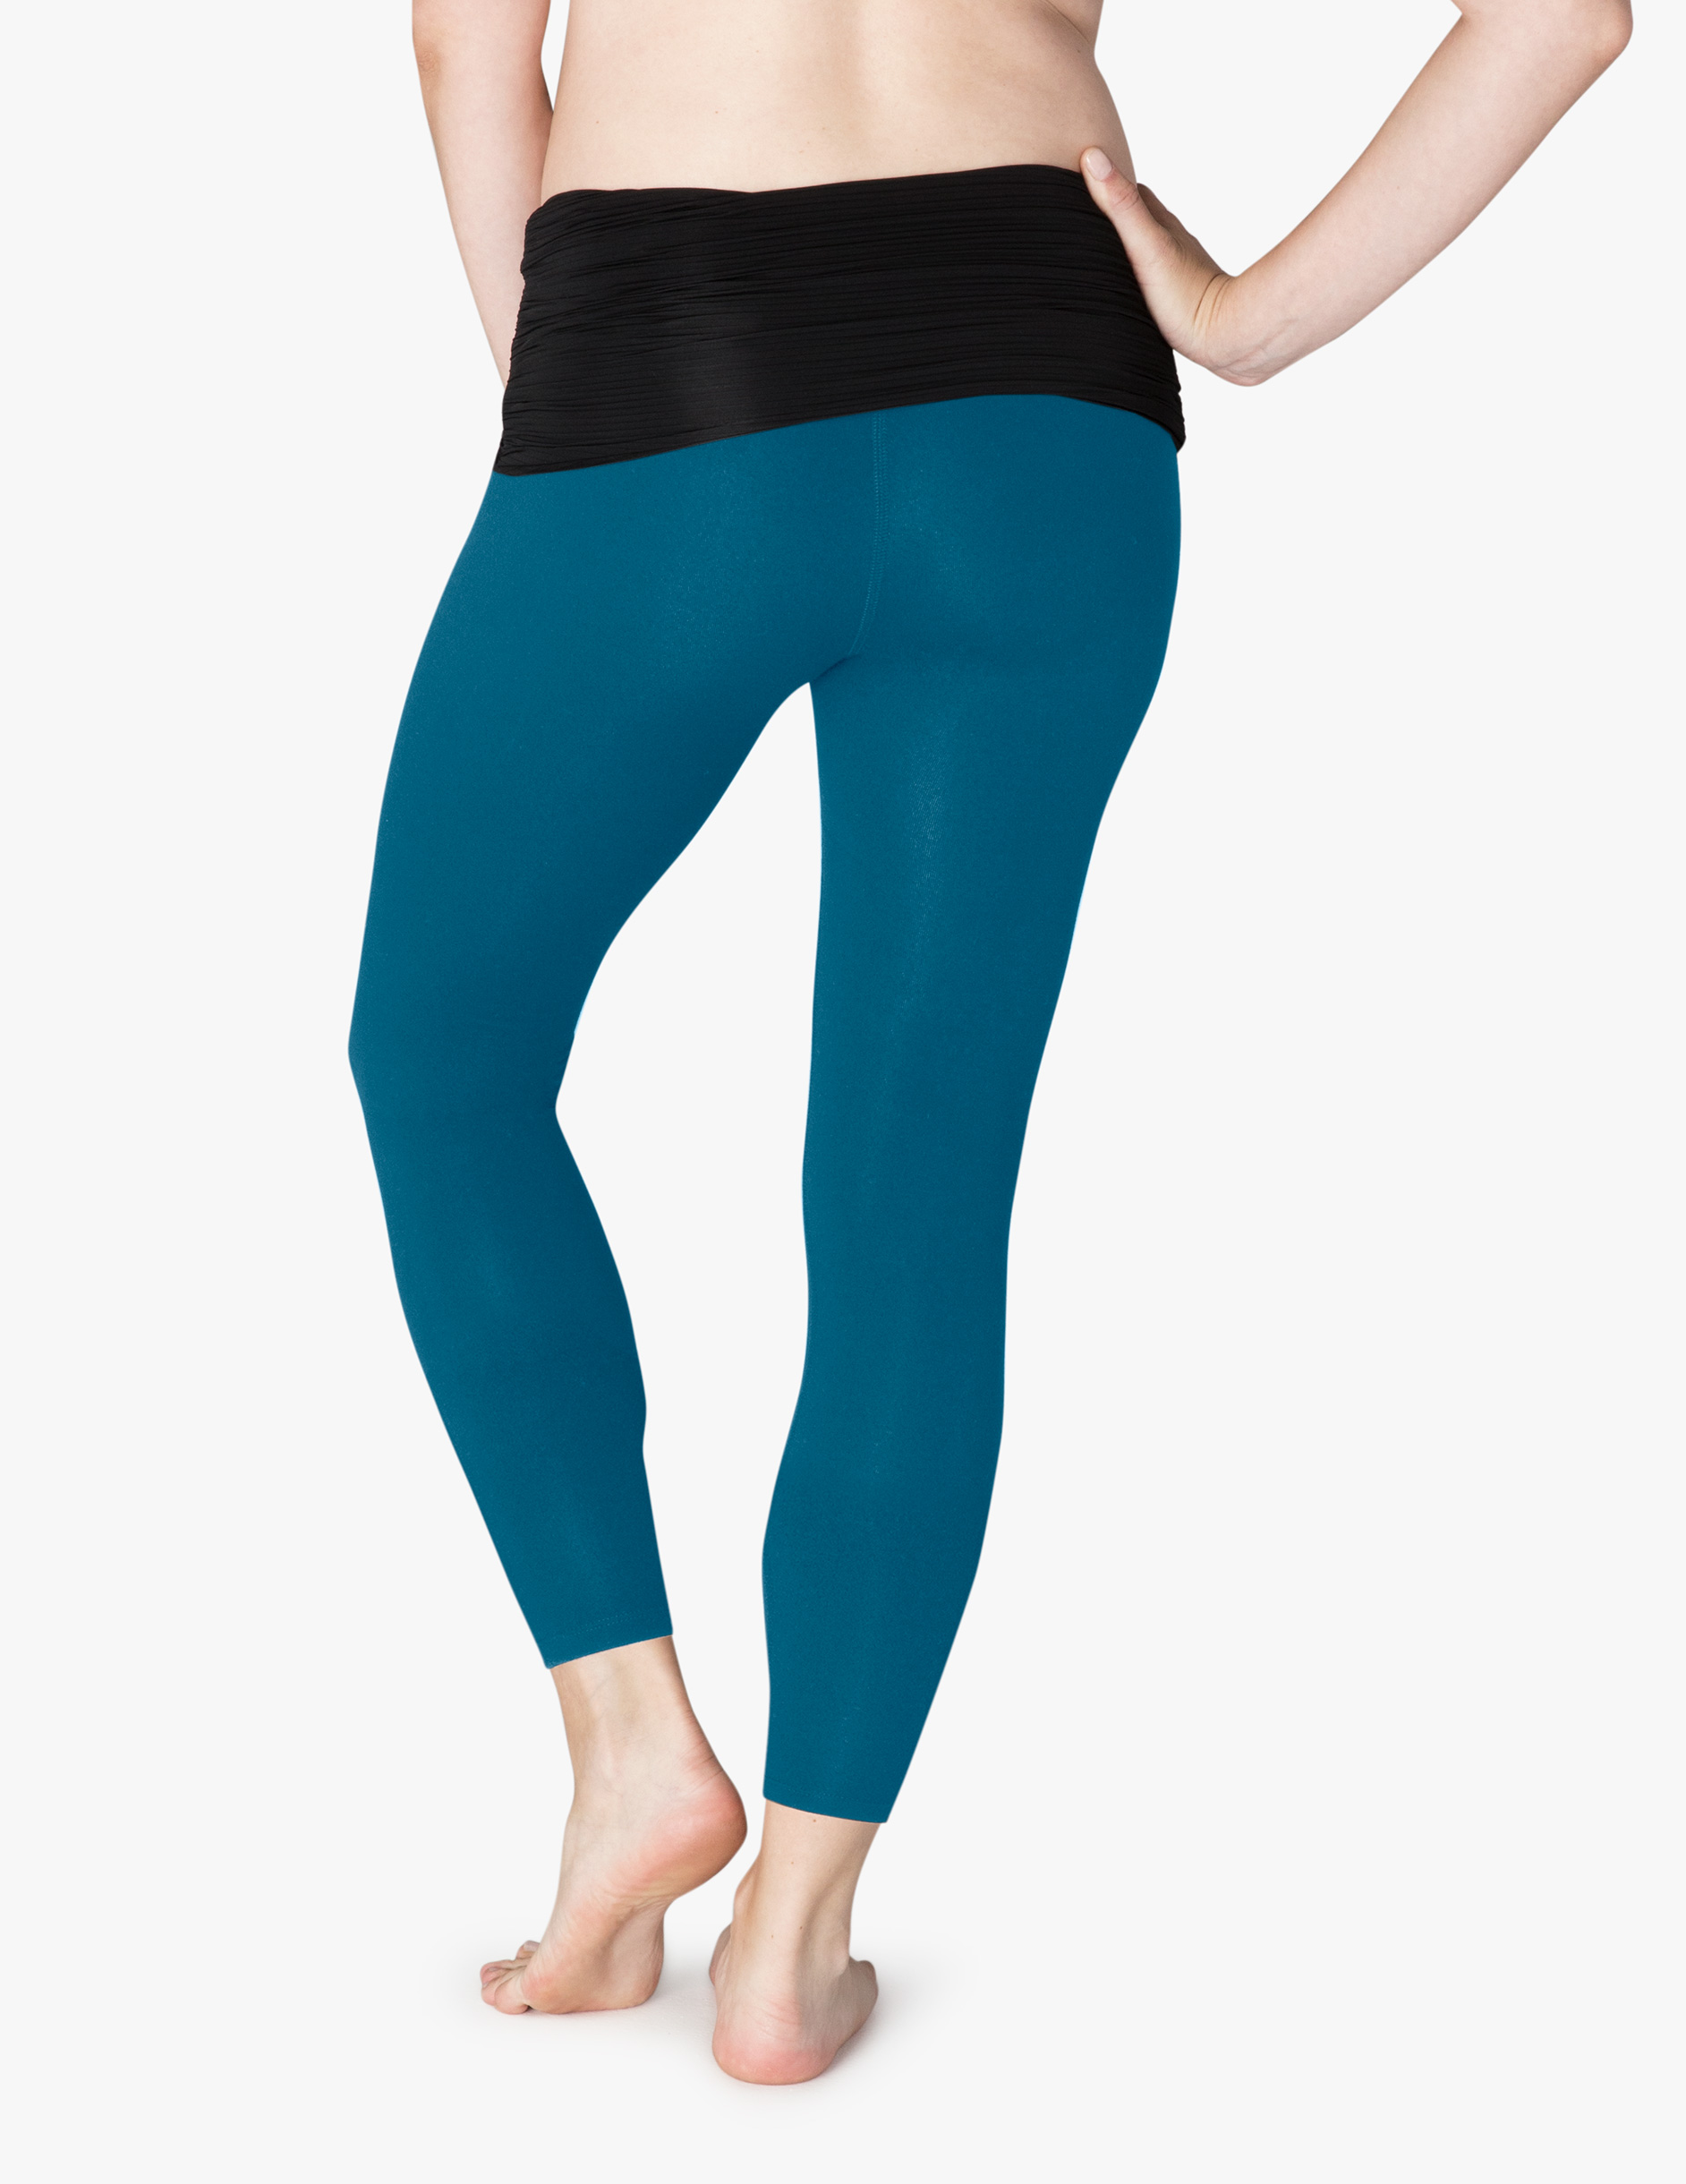 Beyond Yoga Maternity pregnancy clothes sportswear deep sapphire blue